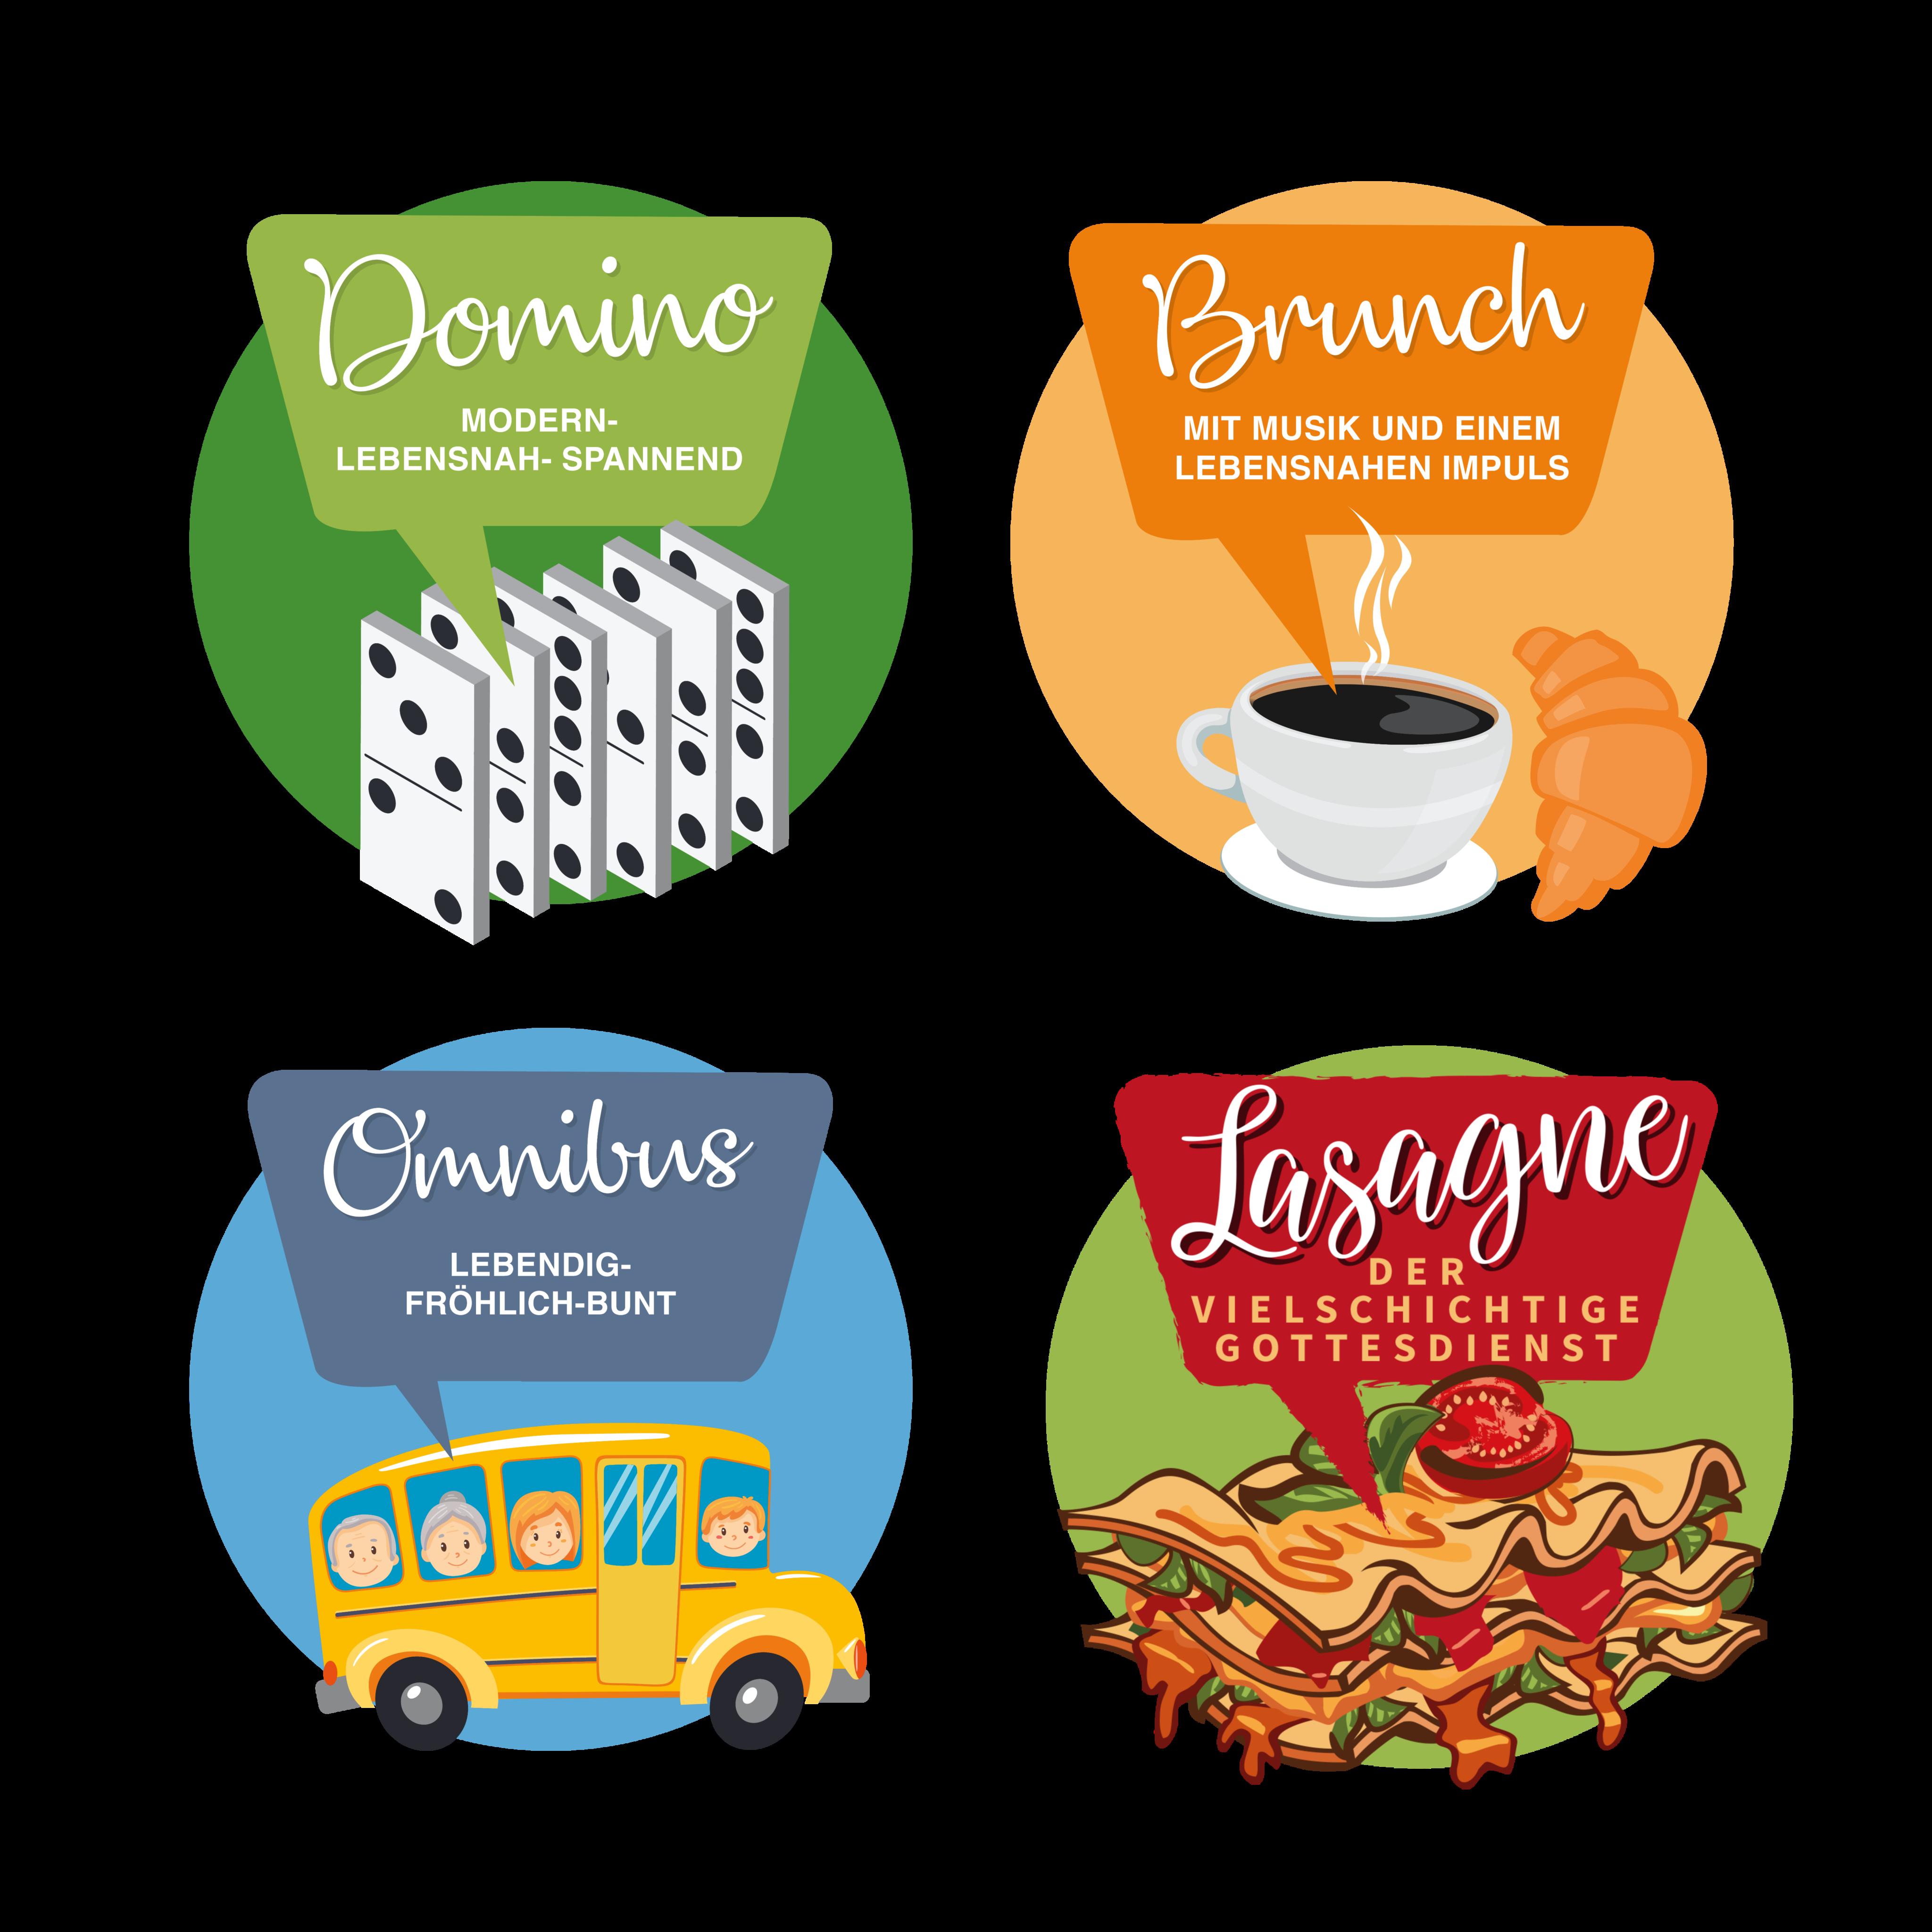 4 Gottesdienst-Logos: Domino, Brunch, Omnibus, Lasagne